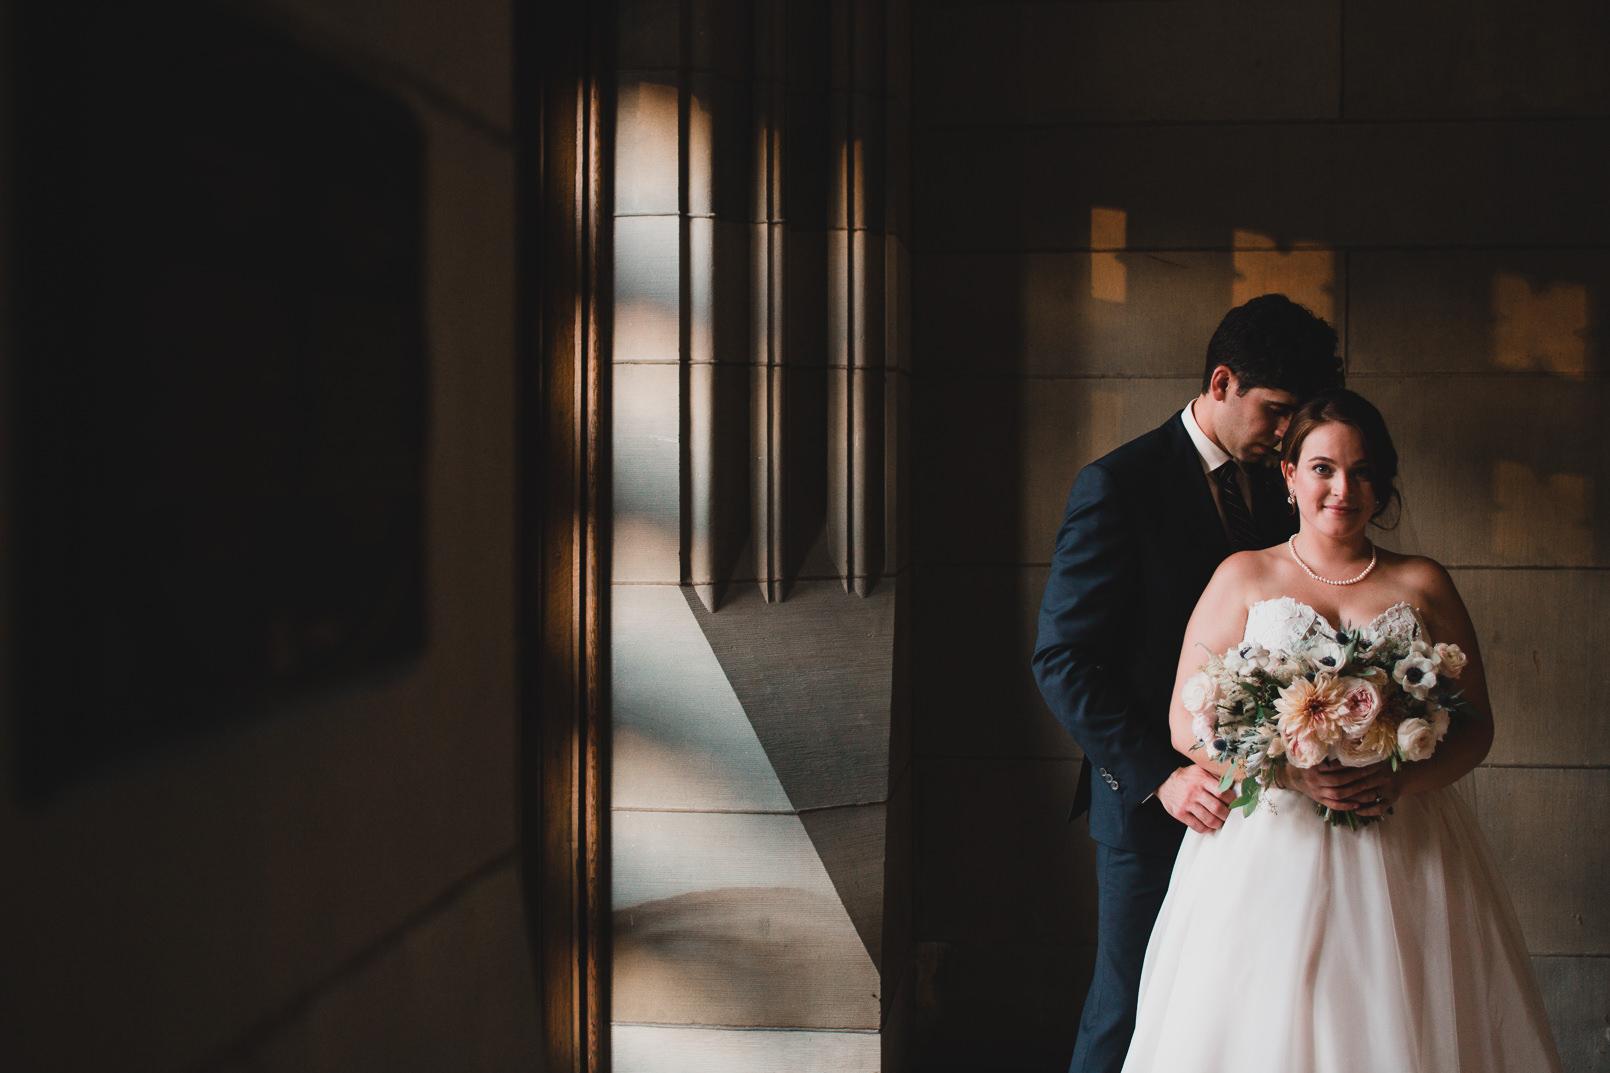 034-Jonathan-Kuhn-Photography-Wedding-_mini.jpg